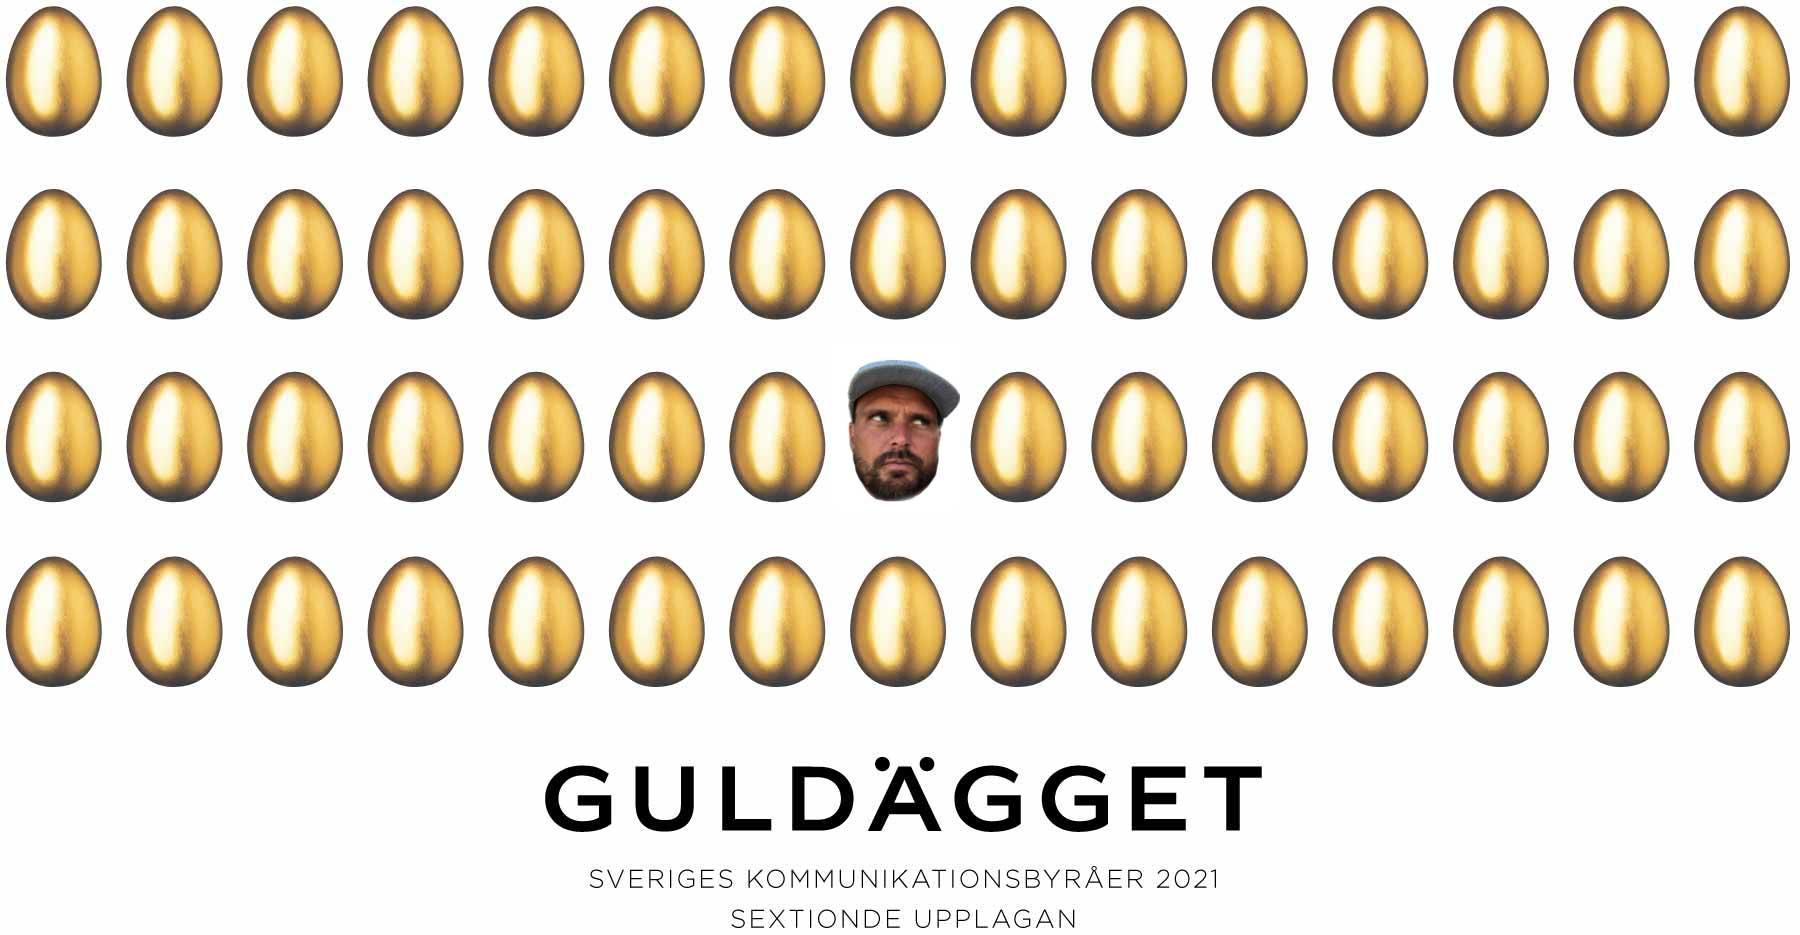 Guldägget Jury Member Per from Bloomy Ideas